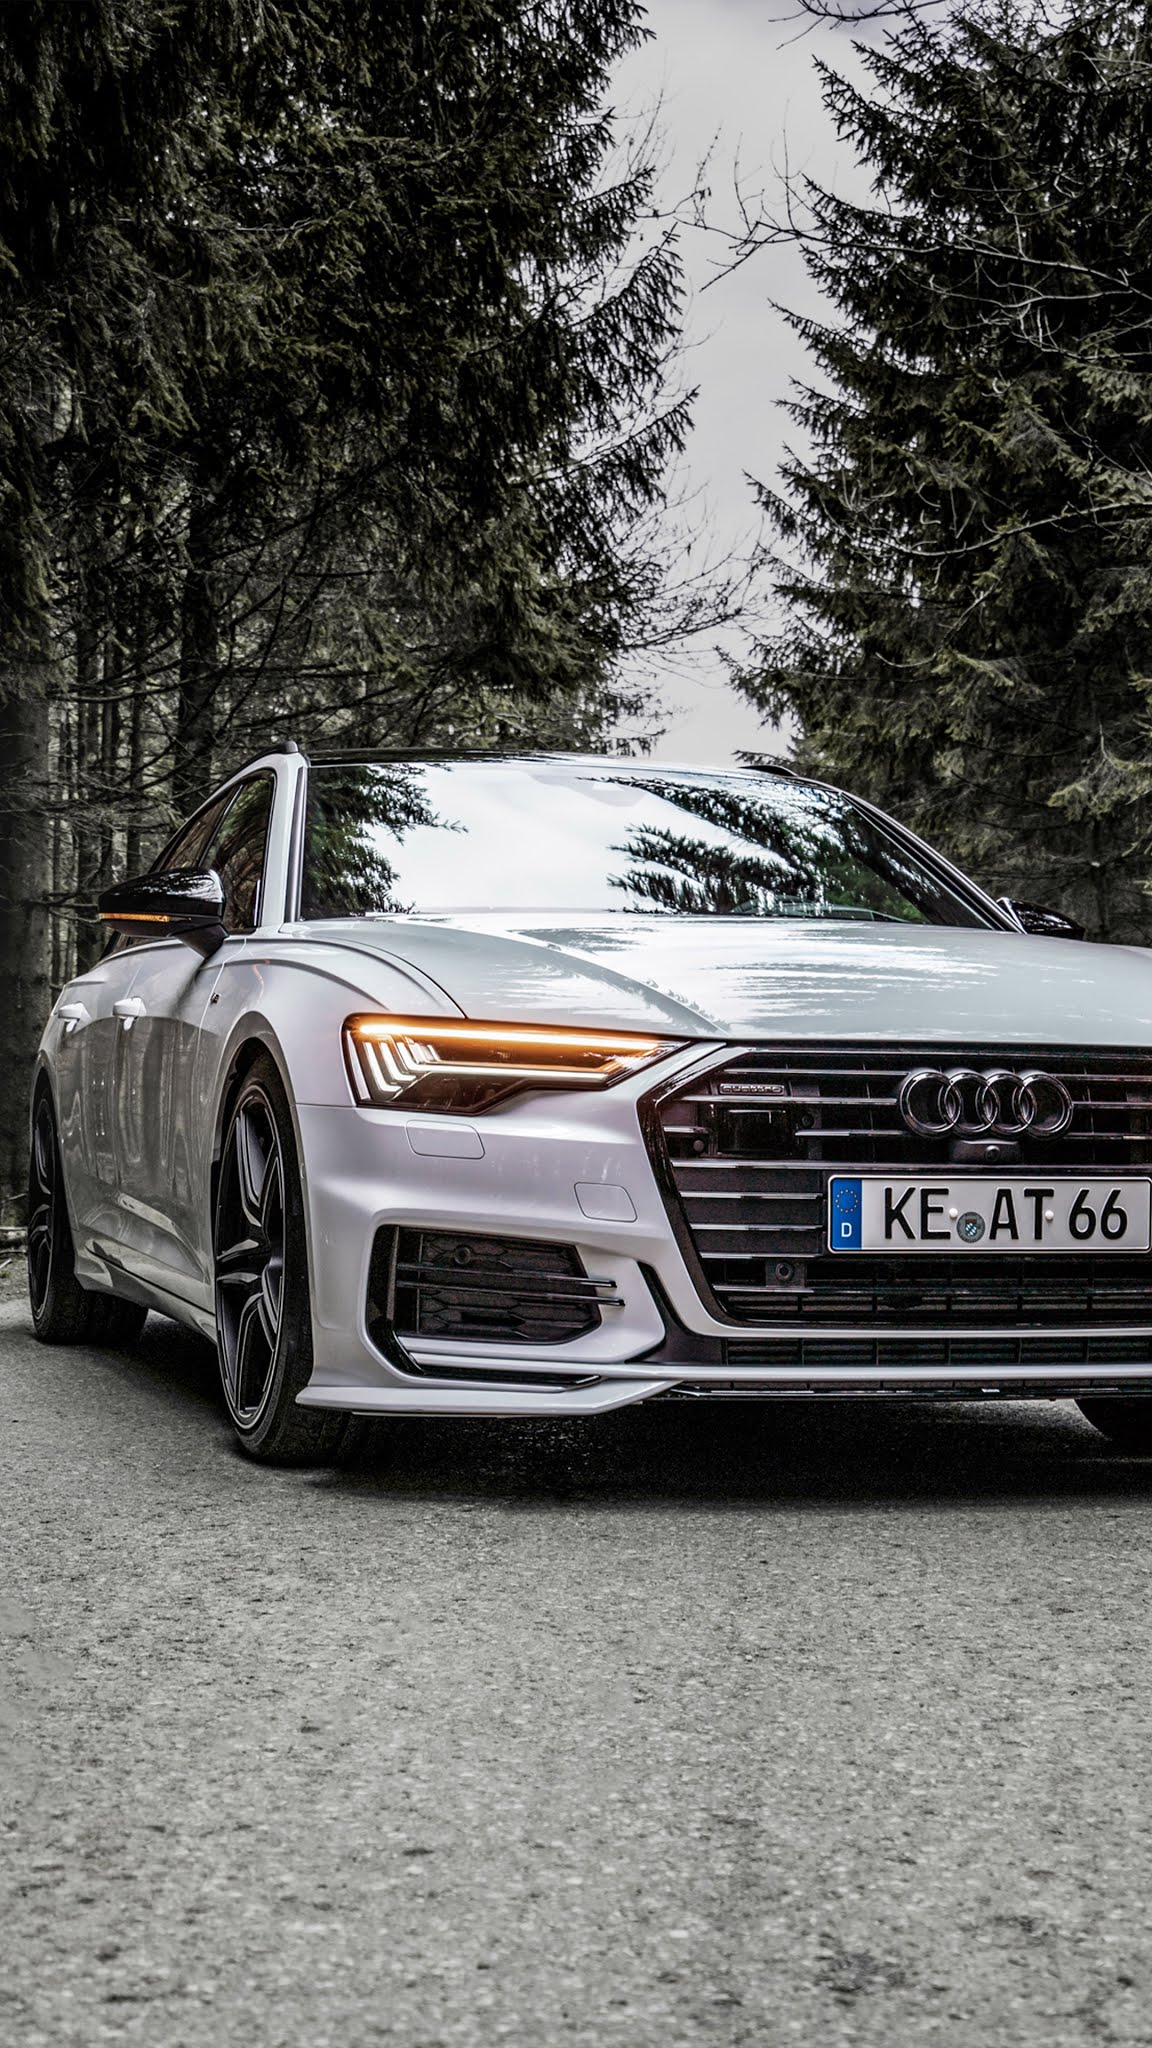 Abt Audi A6 TDI Avant 2019 Mobile Wallpaper